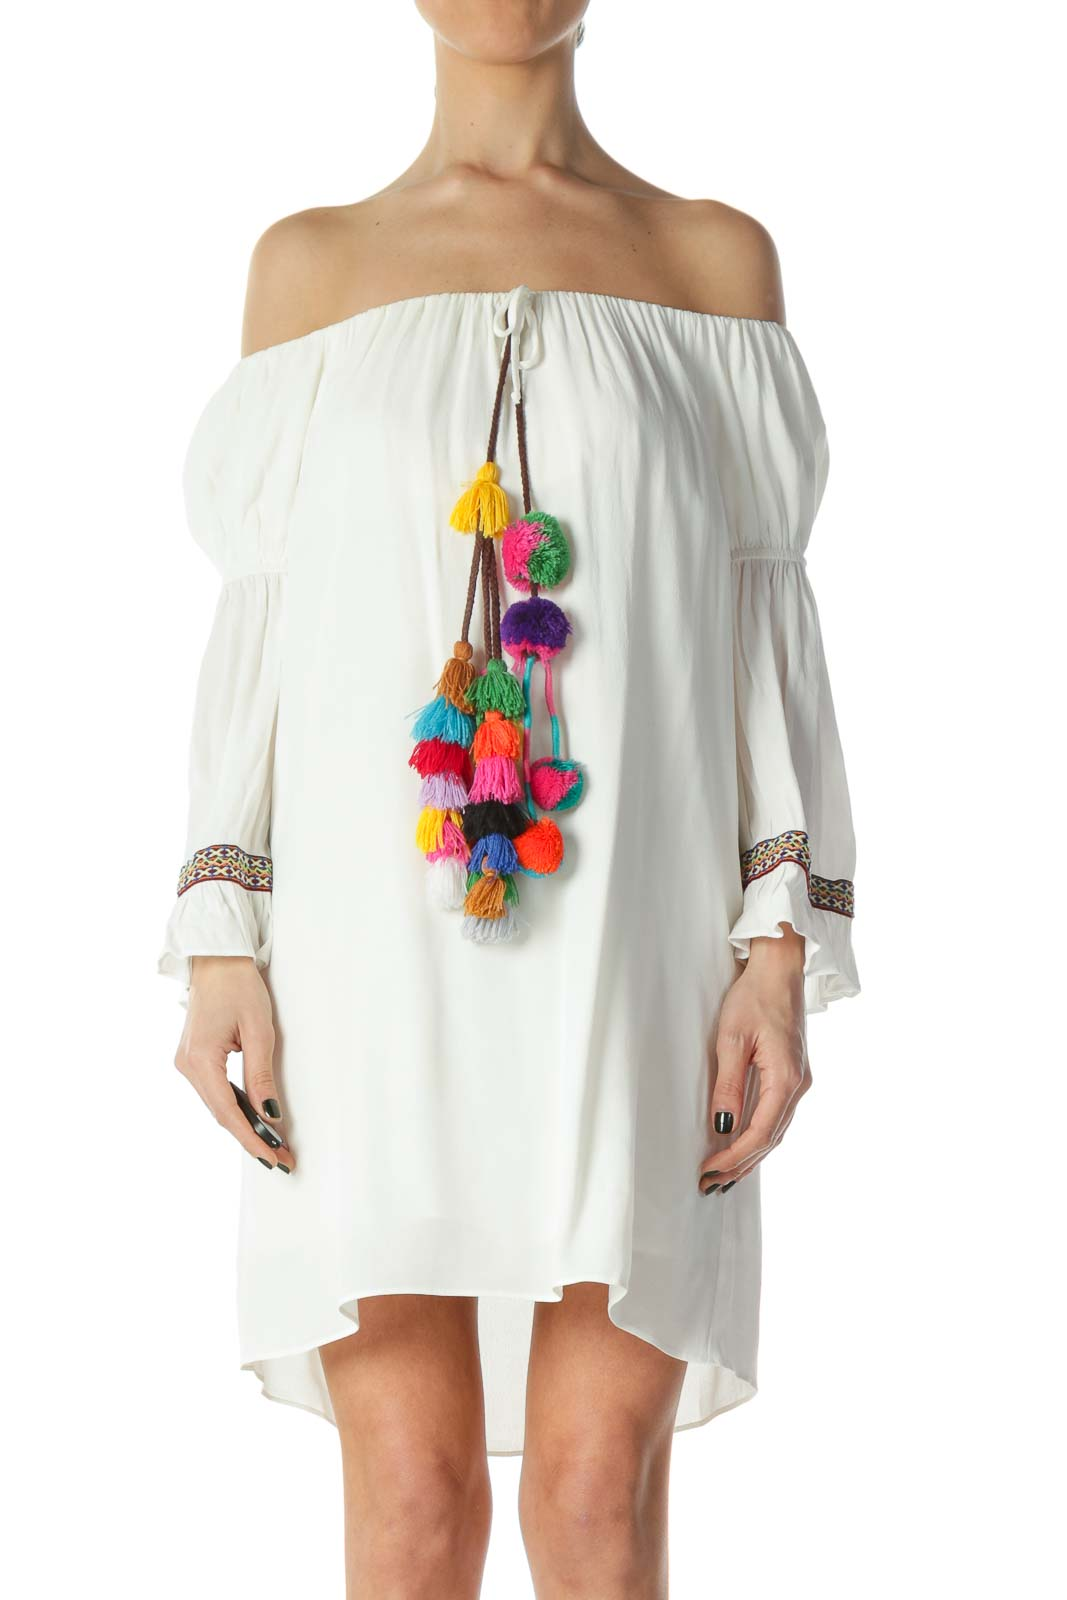 White Off-Shoulder Boho Pom-Pom Detail Dress Front